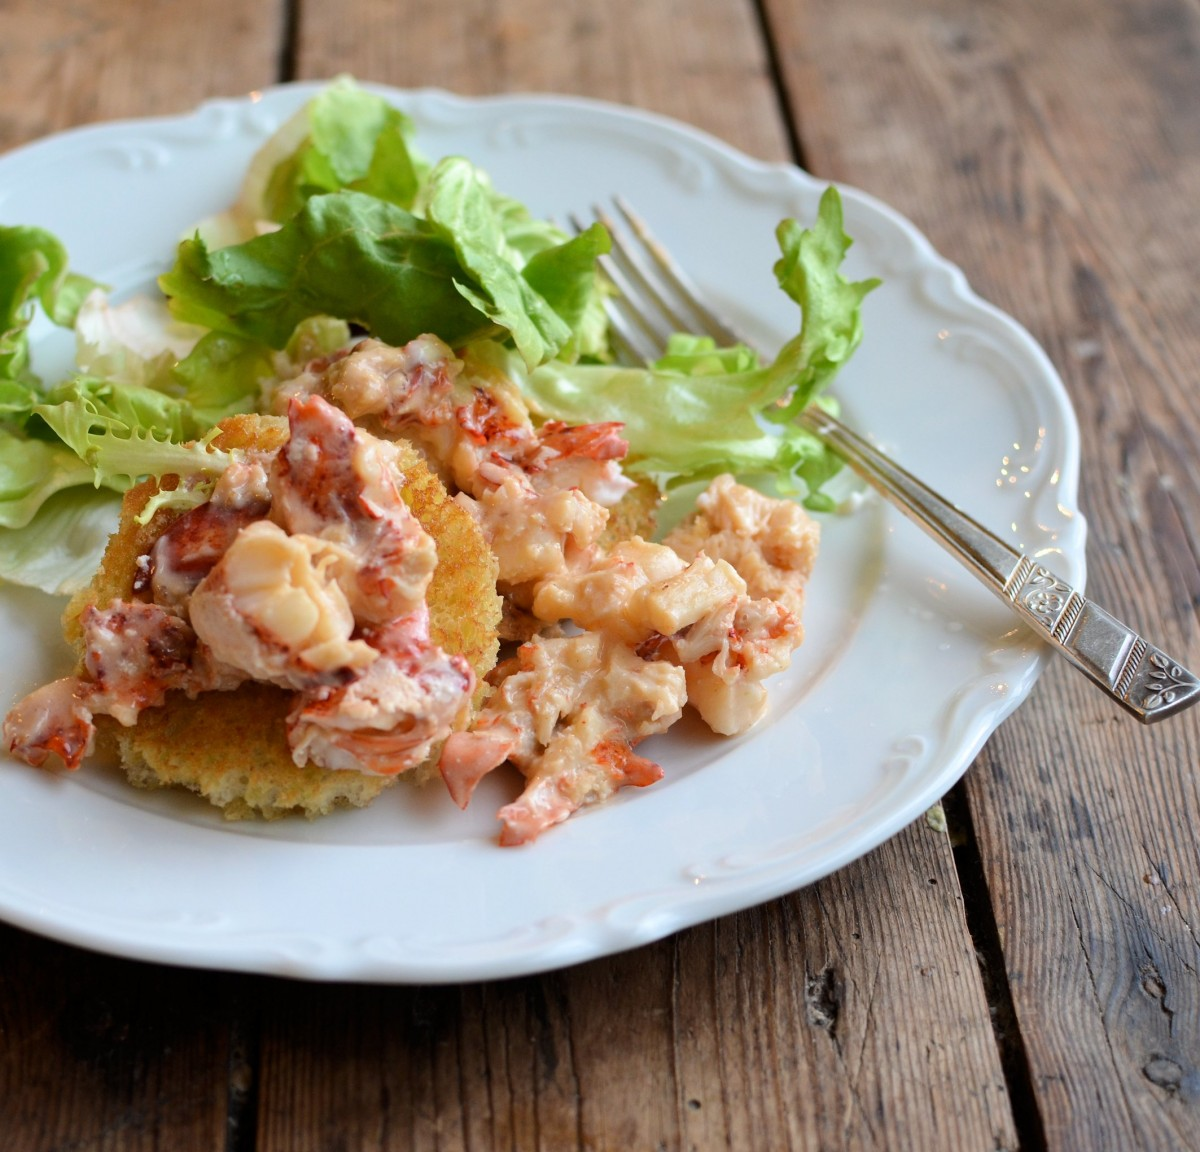 fancy lobster newburg - HD1024×983